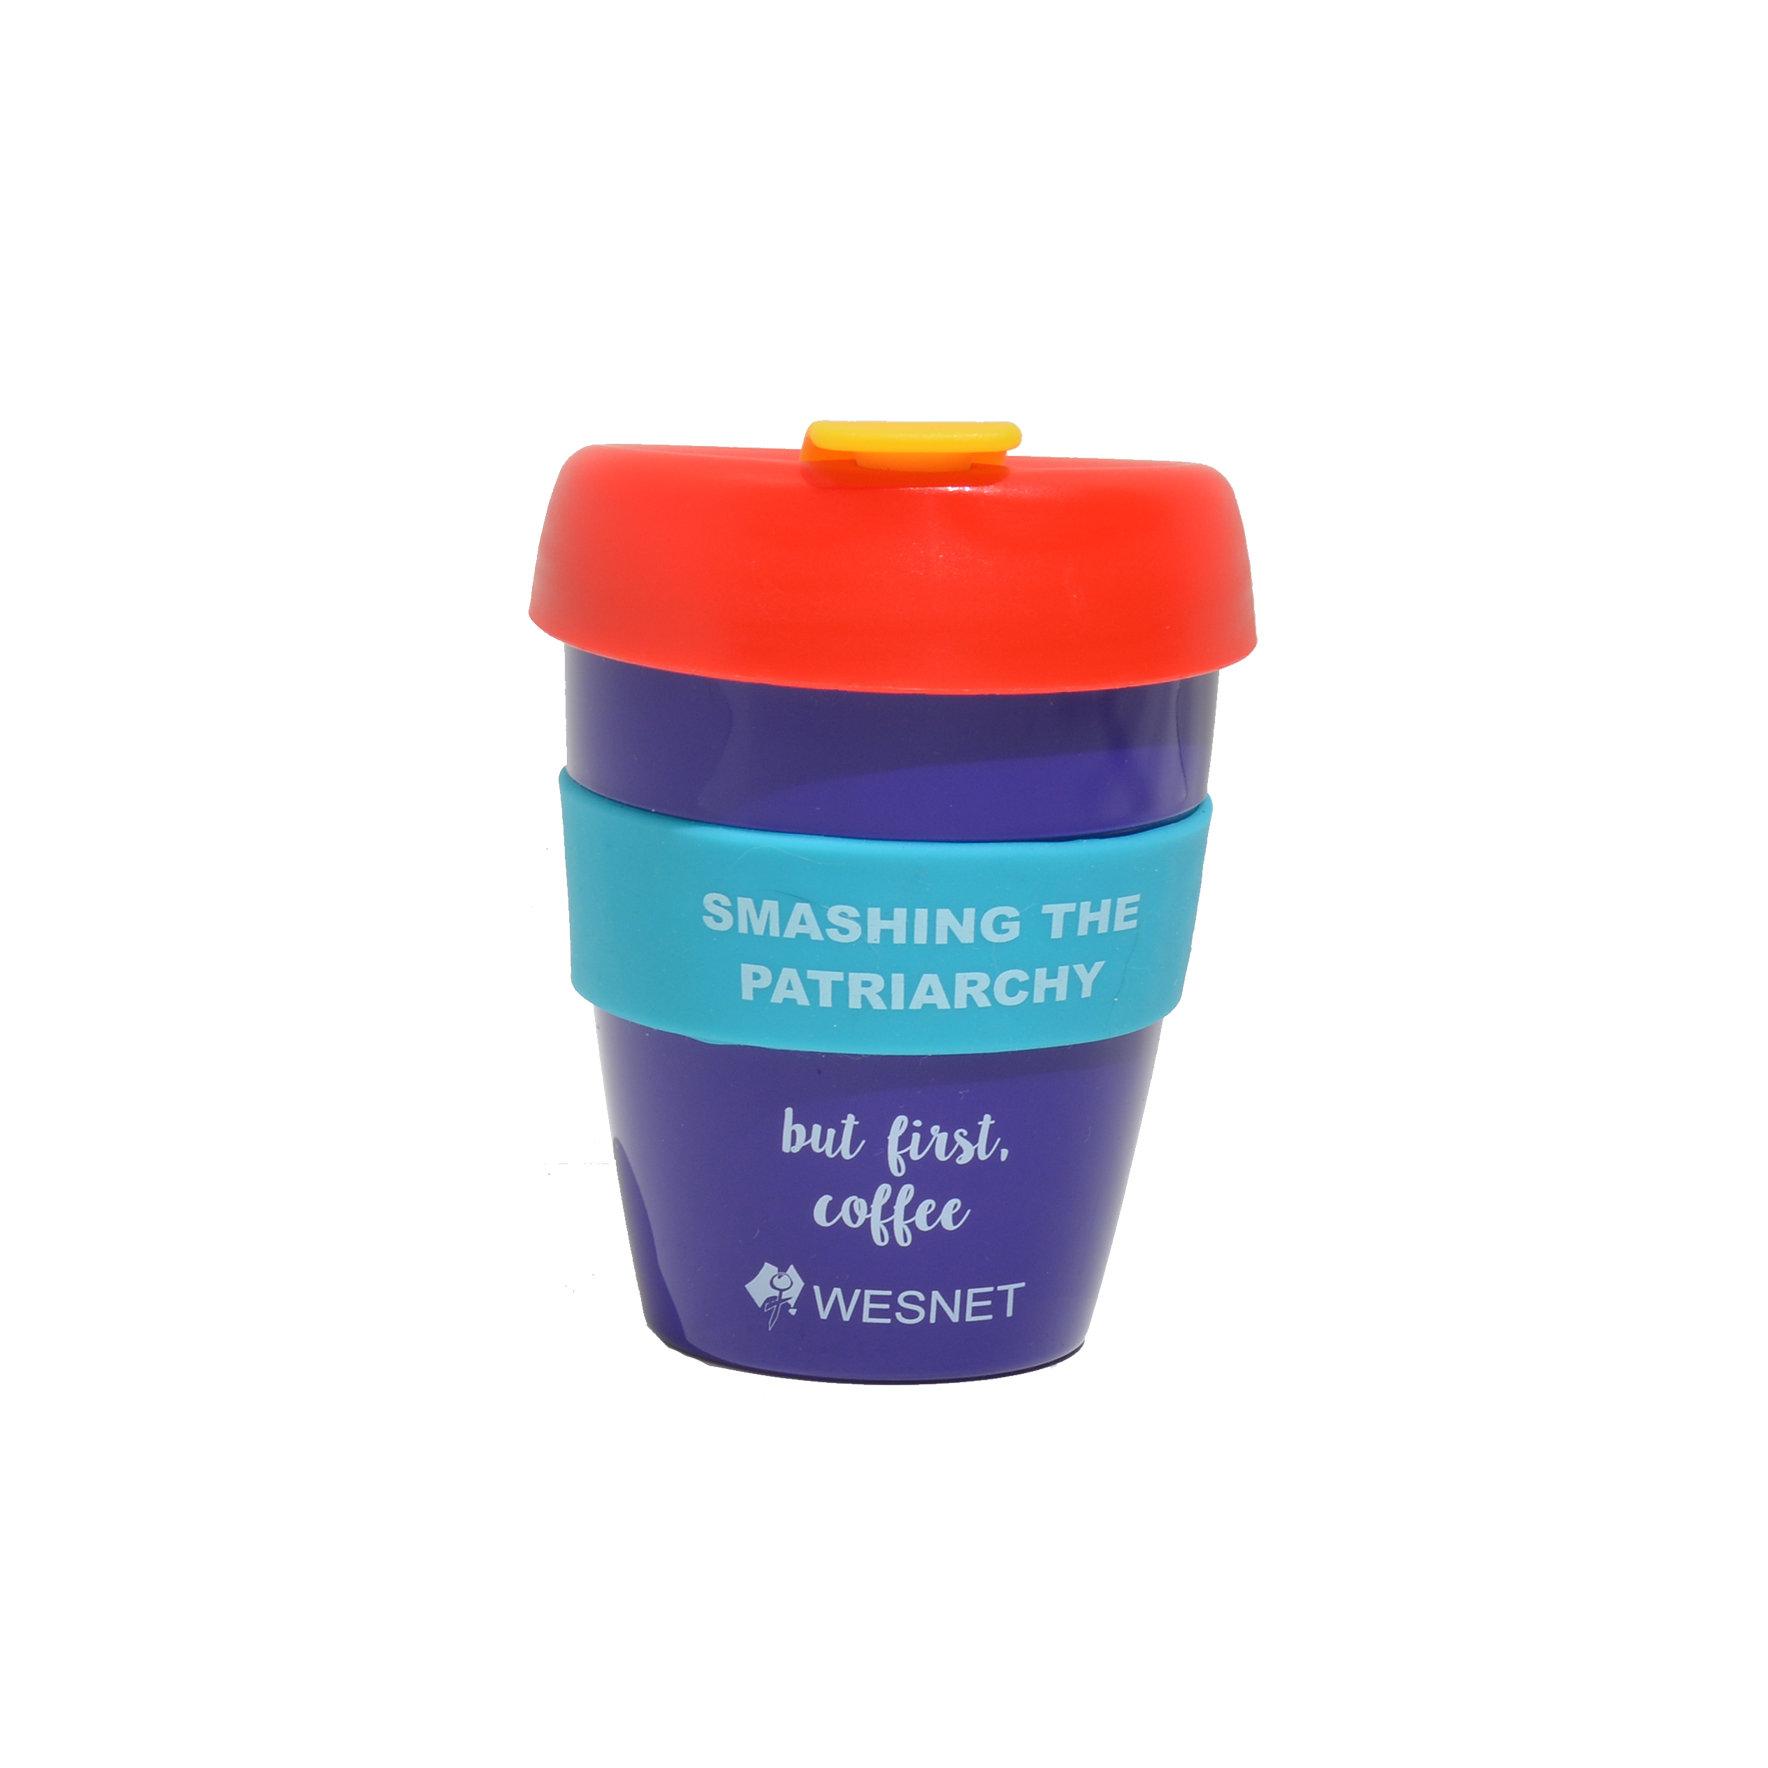 Smashing the Patriarchy Reusable Cup 00010